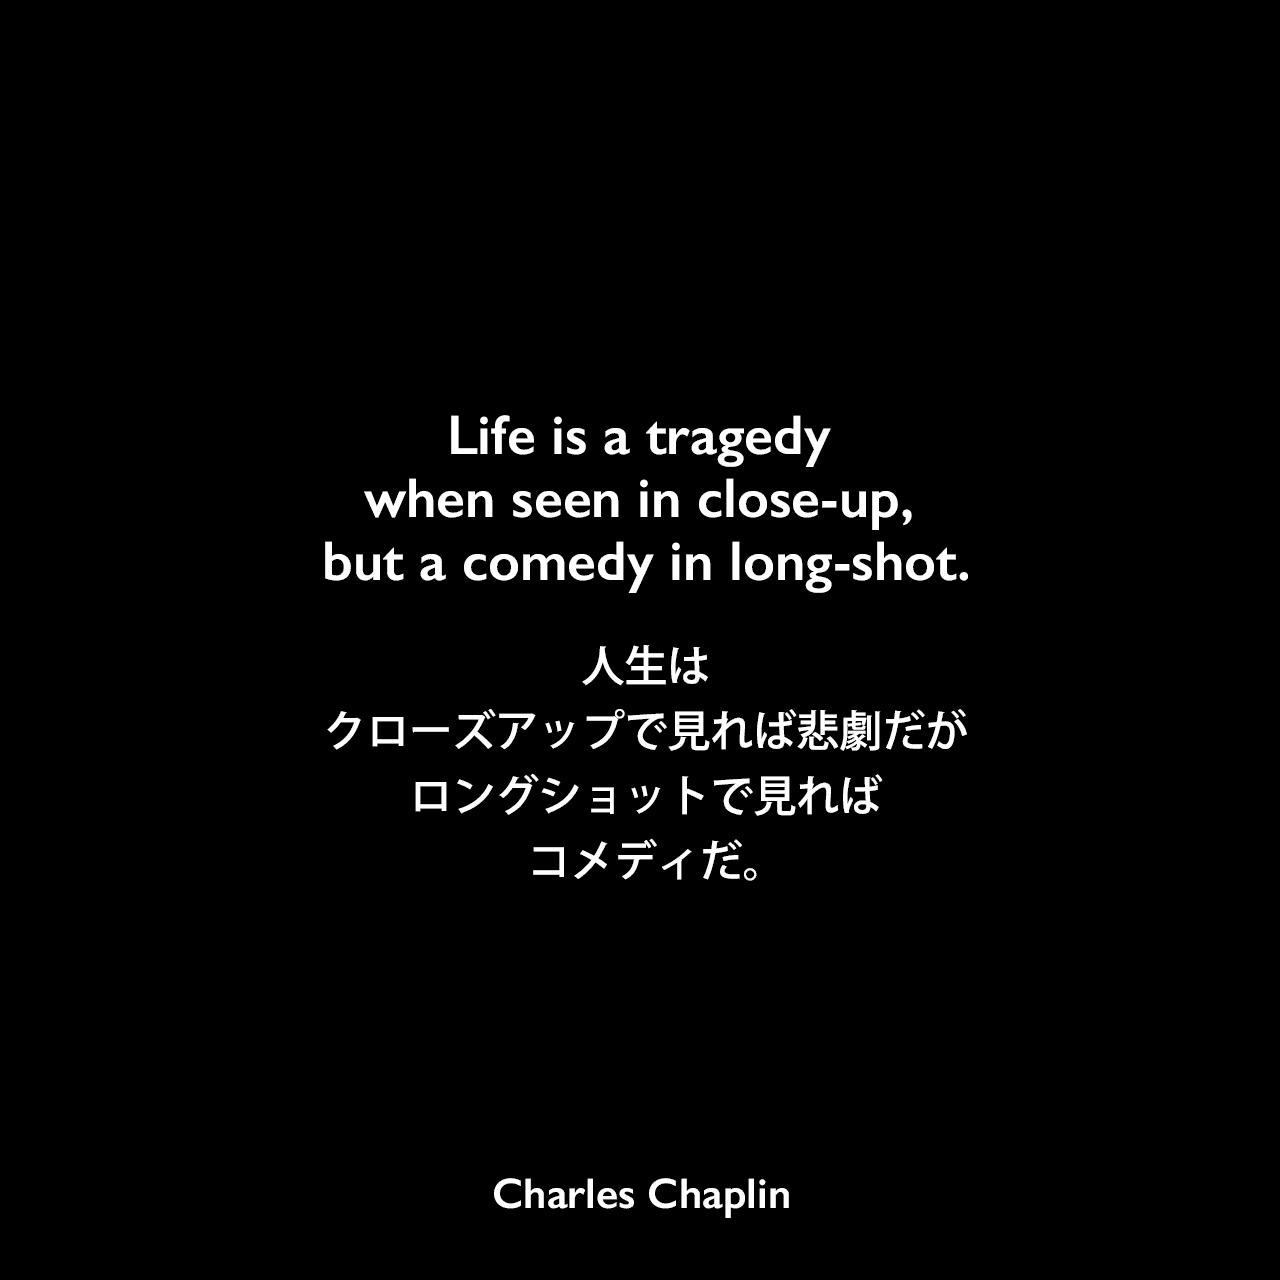 Life is a tragedy when seen in close-up, but a comedy in long-shot.人生はクローズアップで見れば悲劇だが、ロングショットで見ればコメディだ。- リチャード・ラウドの本でチャップリンの言葉として紹介Charles Chaplin